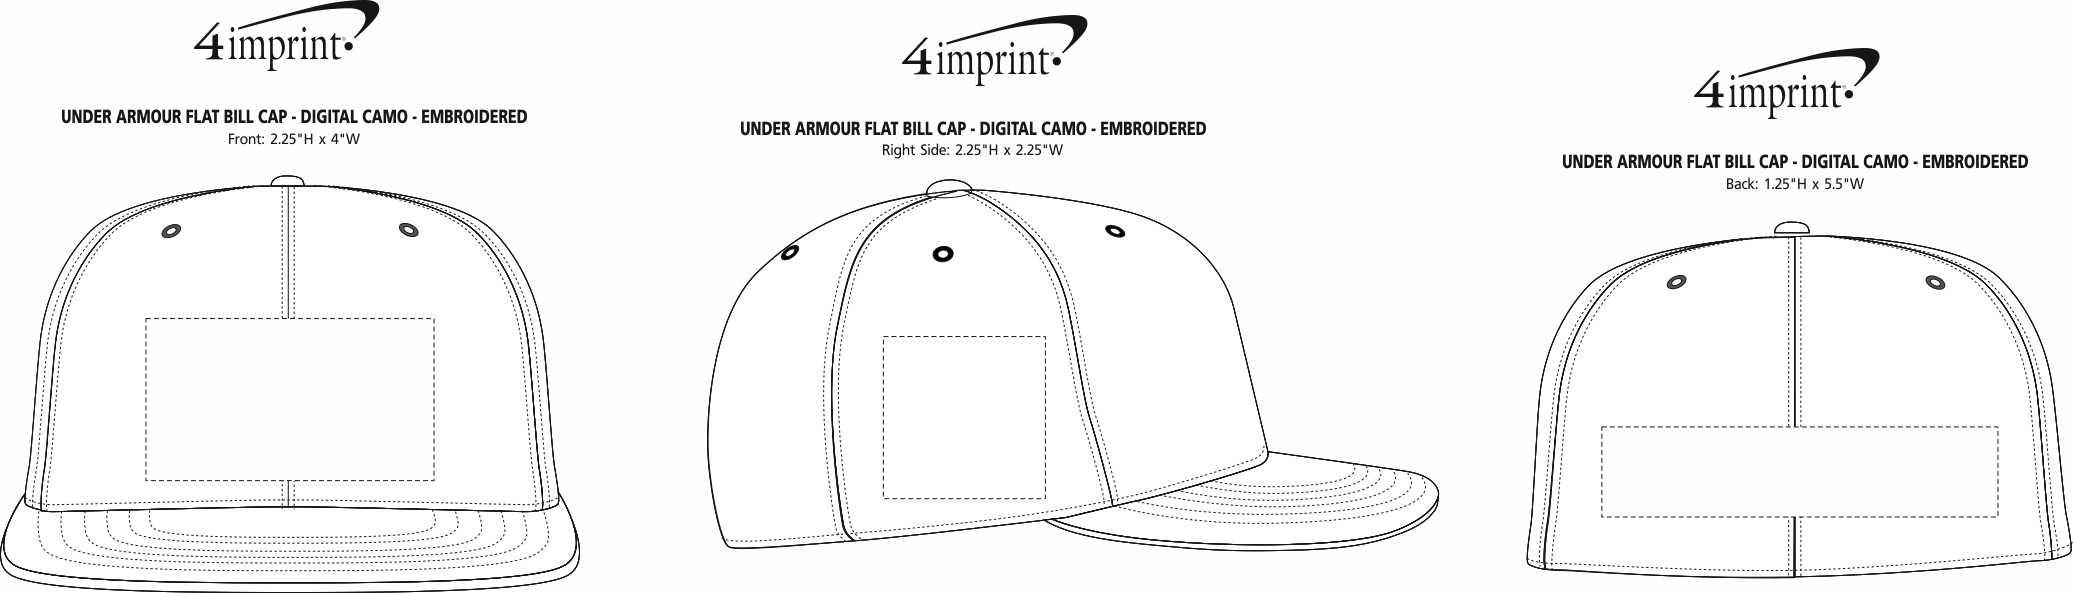 huge discount 53937 a7fb3 ... Under Armour Flat Bill Cap - Digital Camo -. View Imprint Area